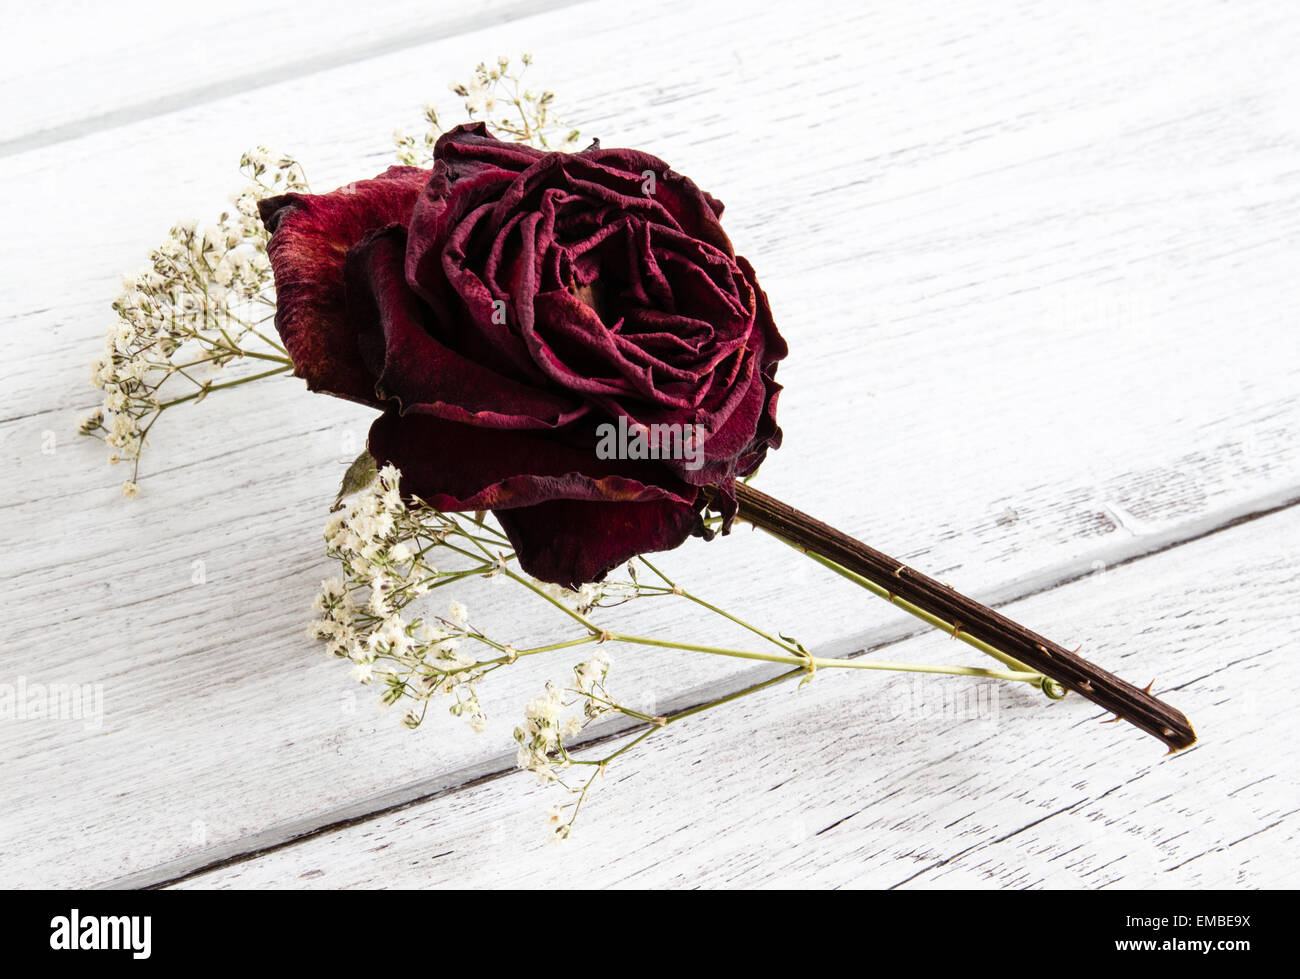 Dried red rose flower with gypsophila wedding buttonhole keepsake on white wood background - Stock Image